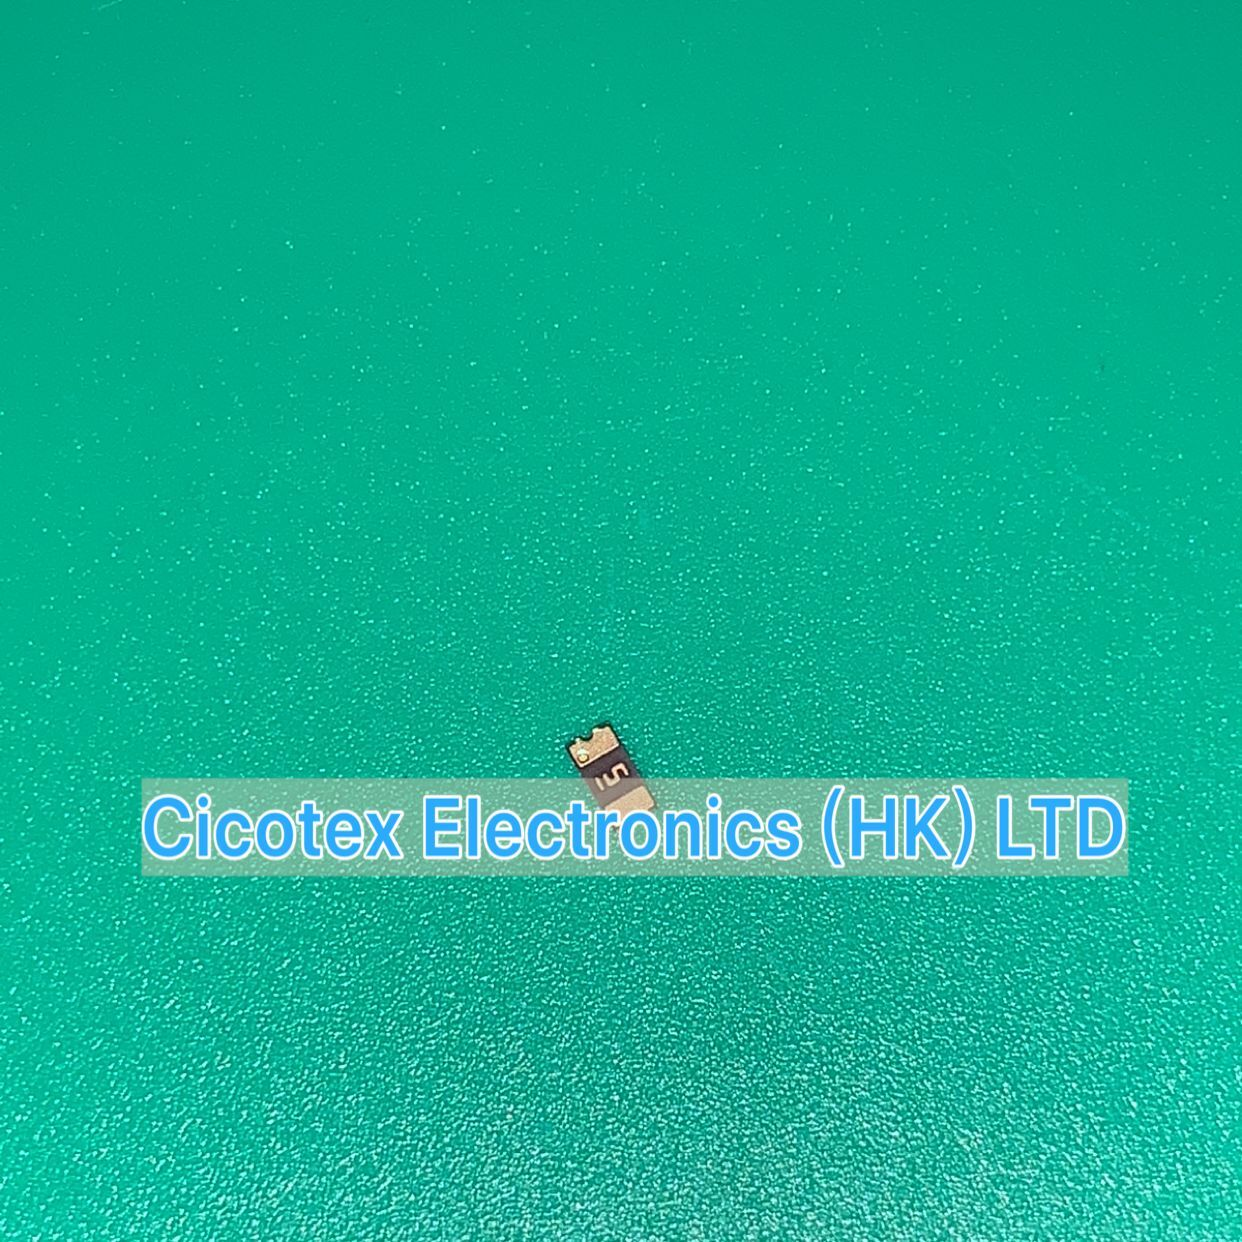 50 pçs/lote MF-NSMF075-2 SMD1206 S MF-NSMF 075-2 0.75A 6V 1206 MF-NSMF075-2-G9 MFNSMF0752 PTC REAJUSTÁVEL